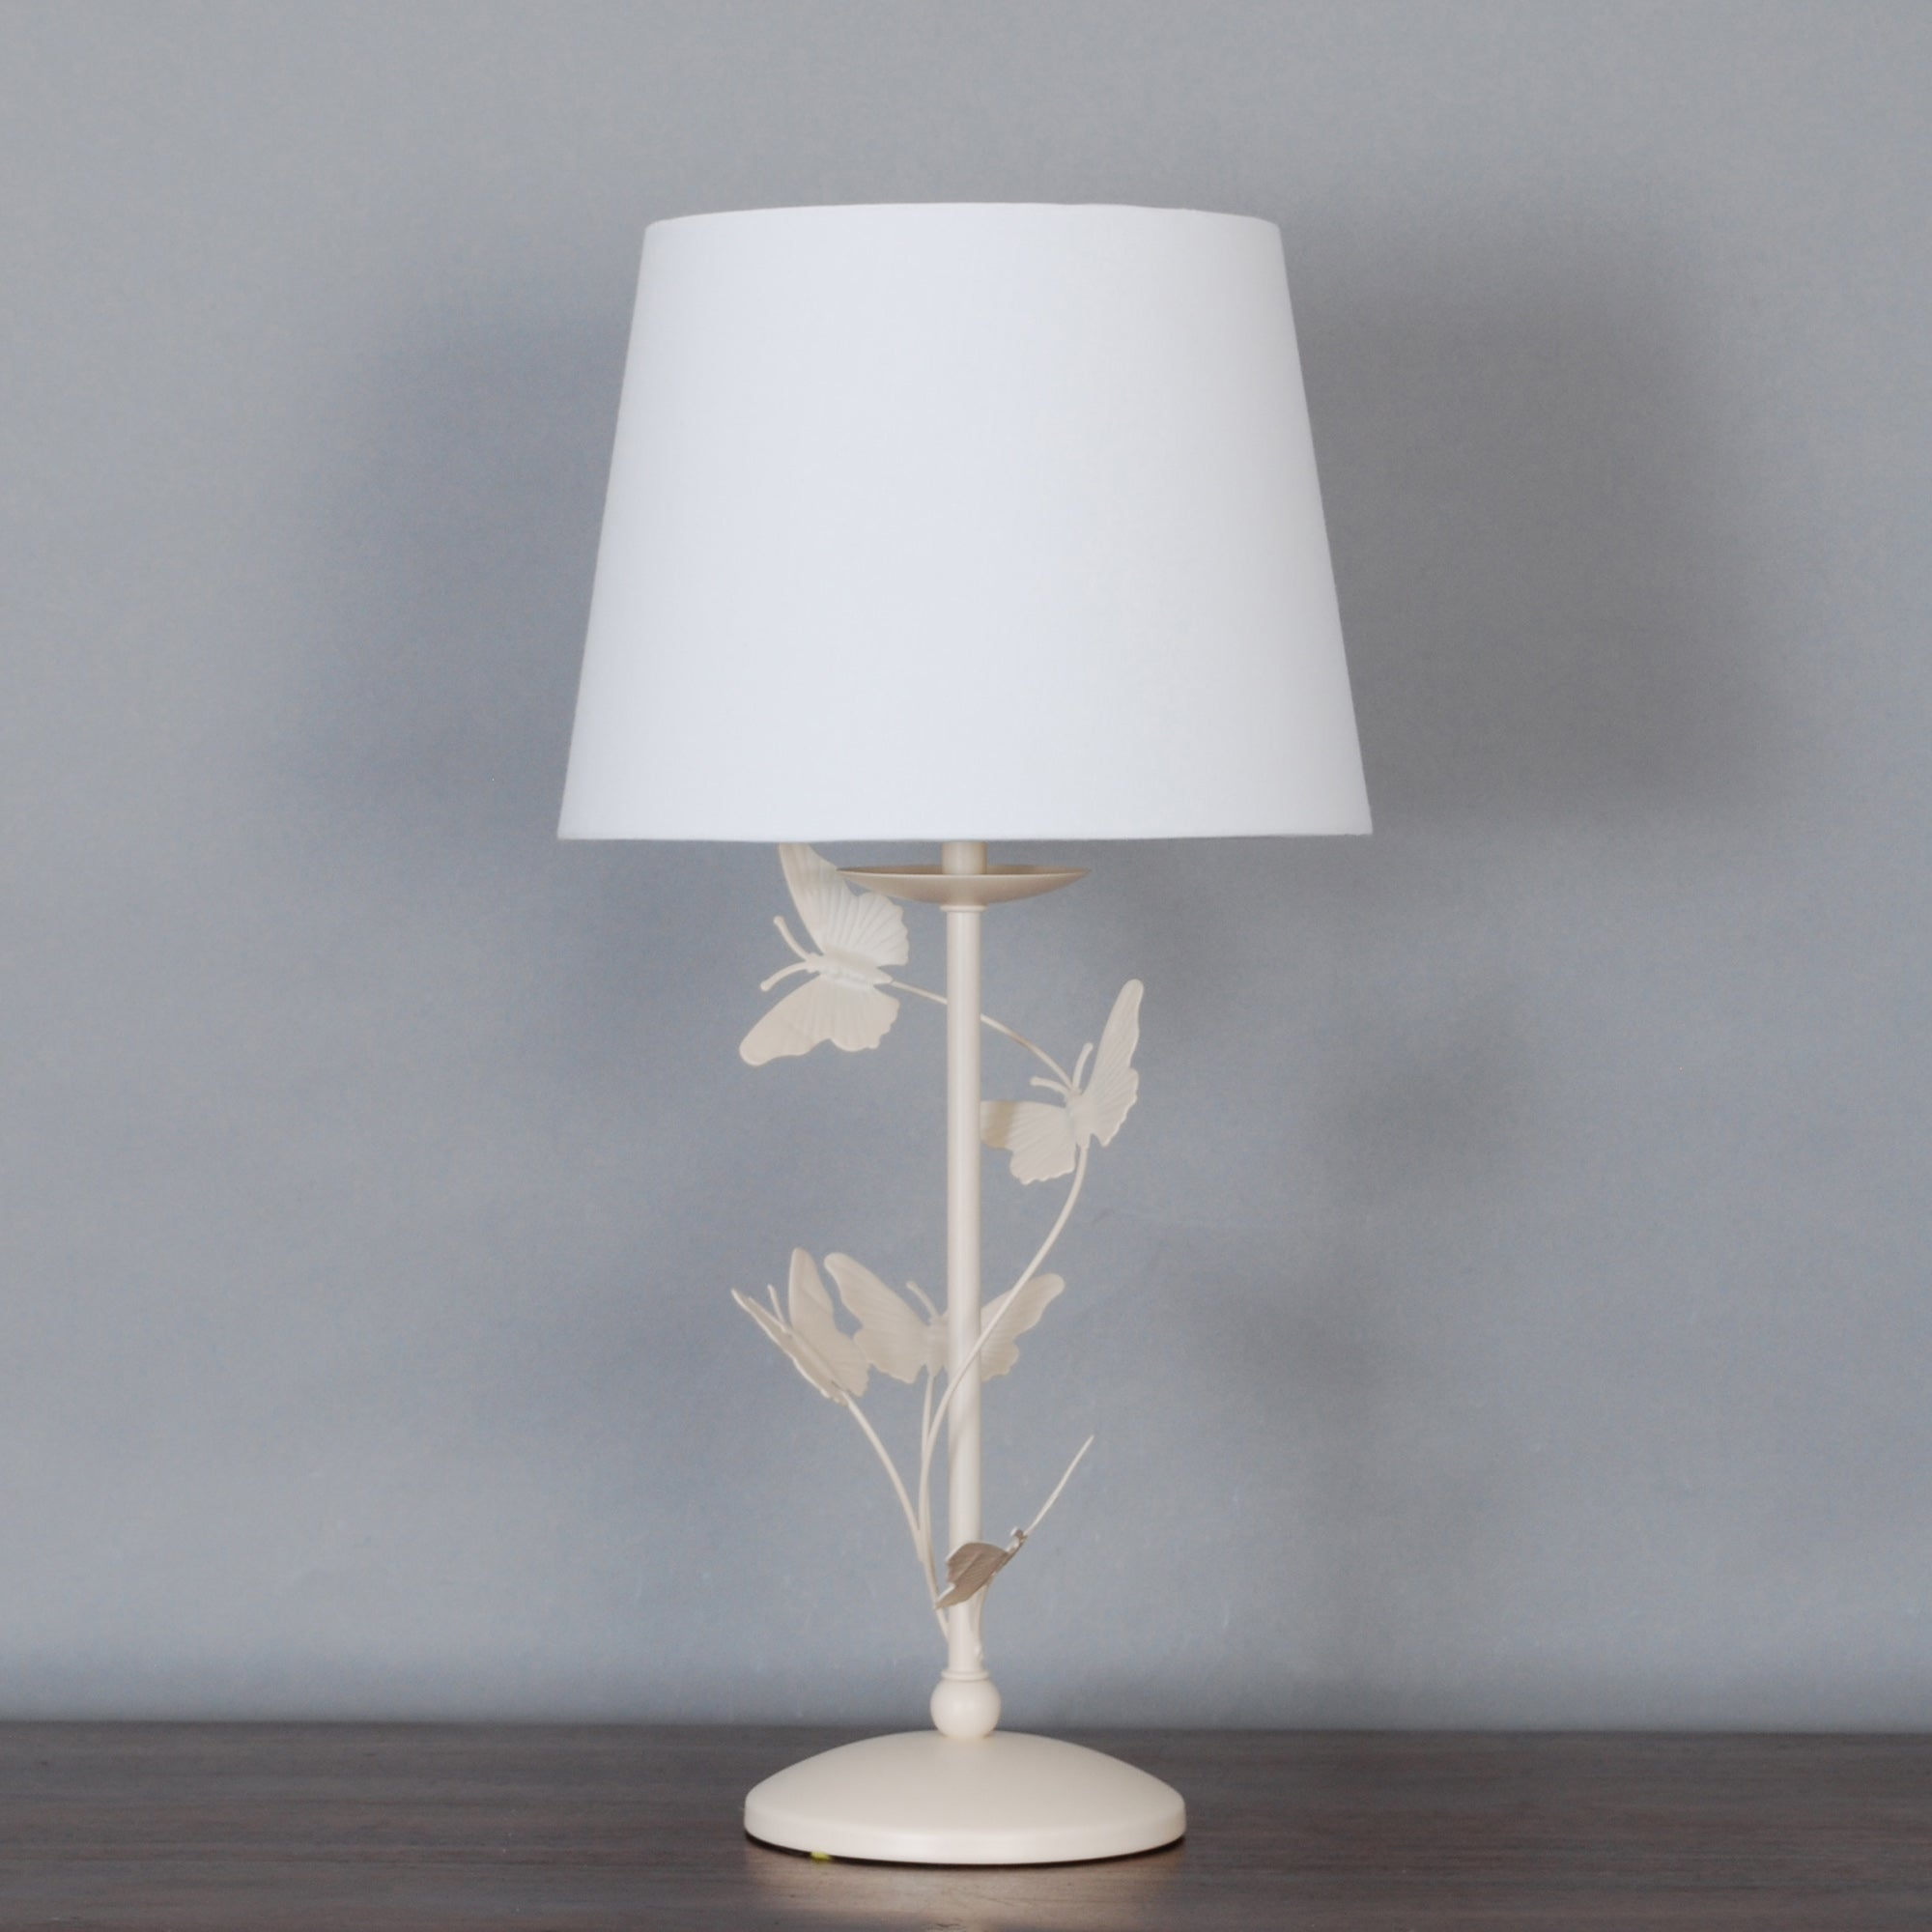 cream bella butterfly table lamp dunelm. Black Bedroom Furniture Sets. Home Design Ideas